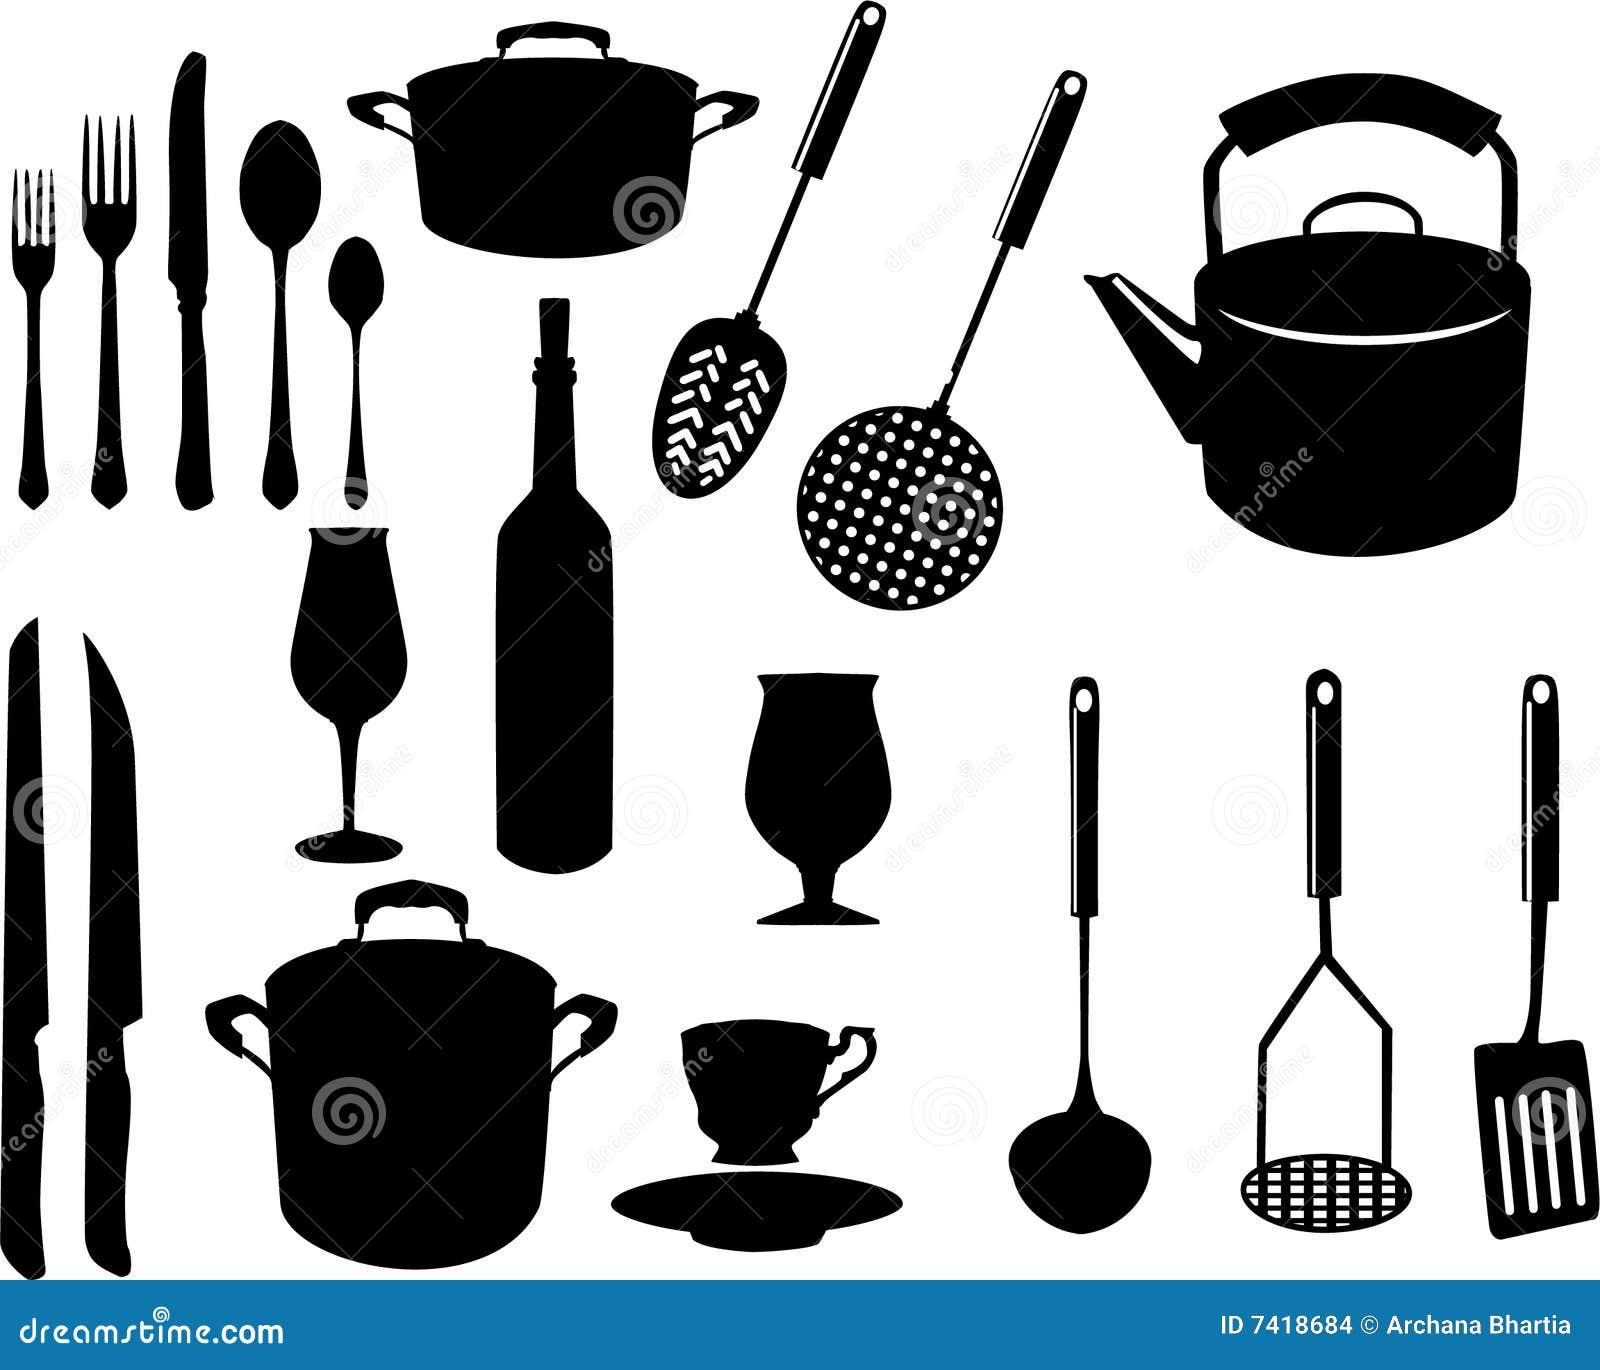 404 not found for Imagenes de utensilios de cocina